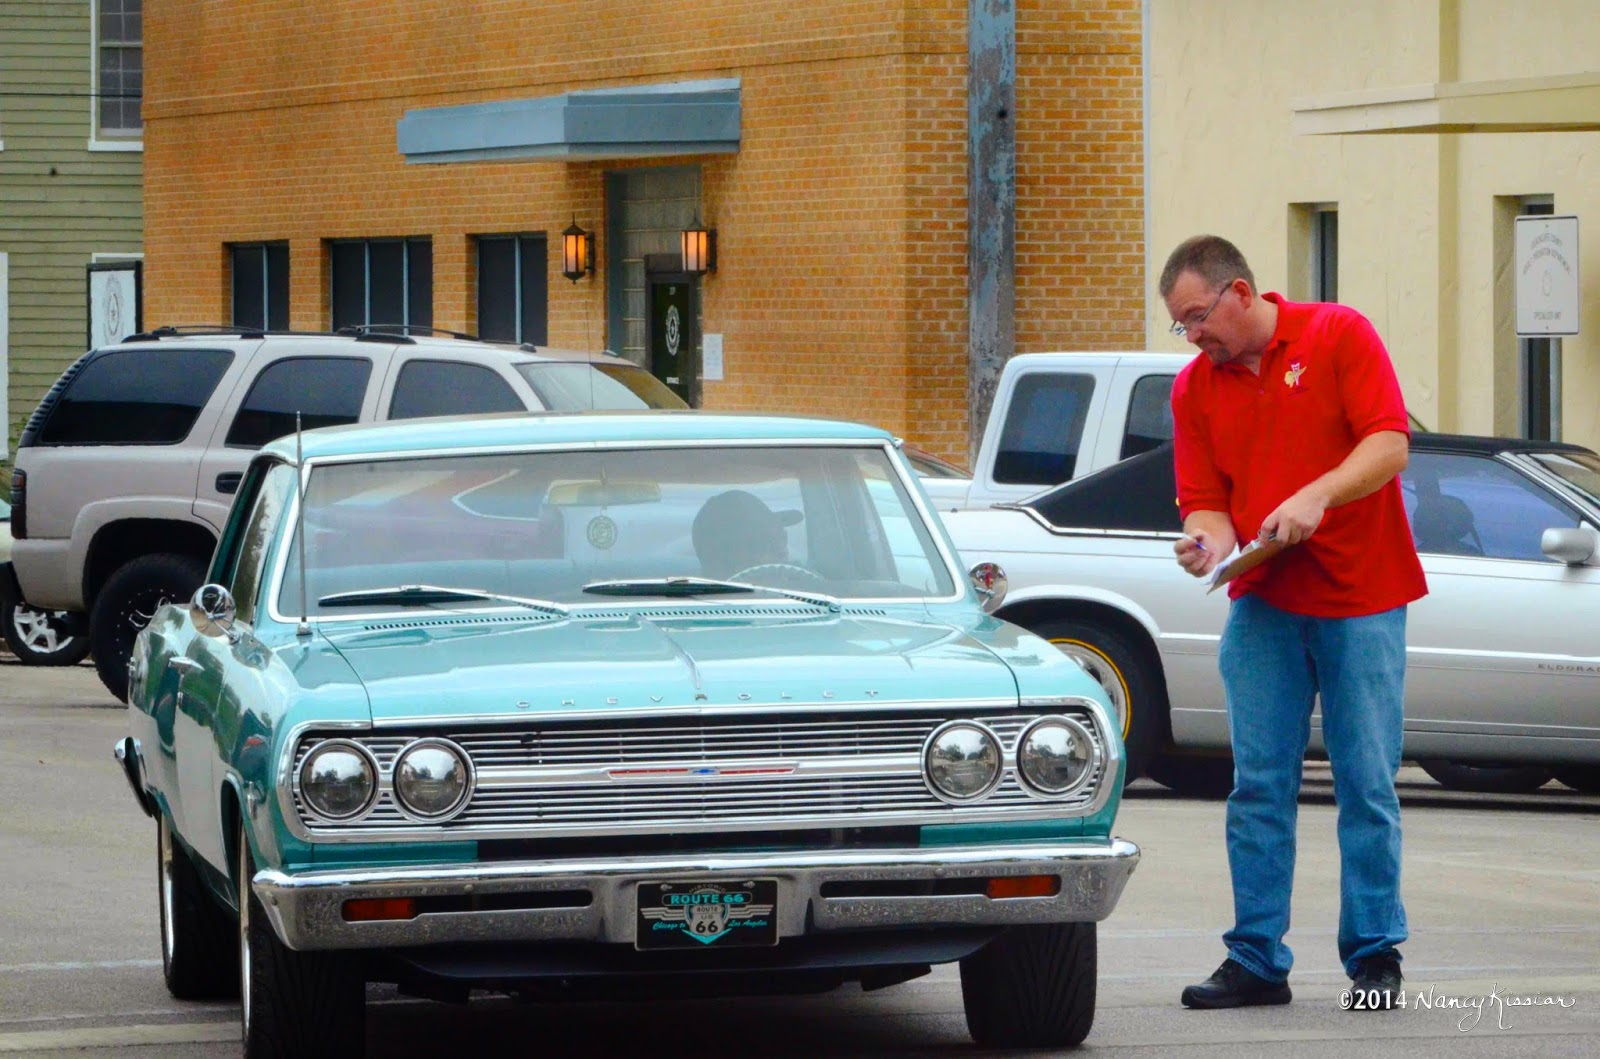 Wild About Texas Pontiac Club Classic Car Show Delights Seguinites - Find car shows